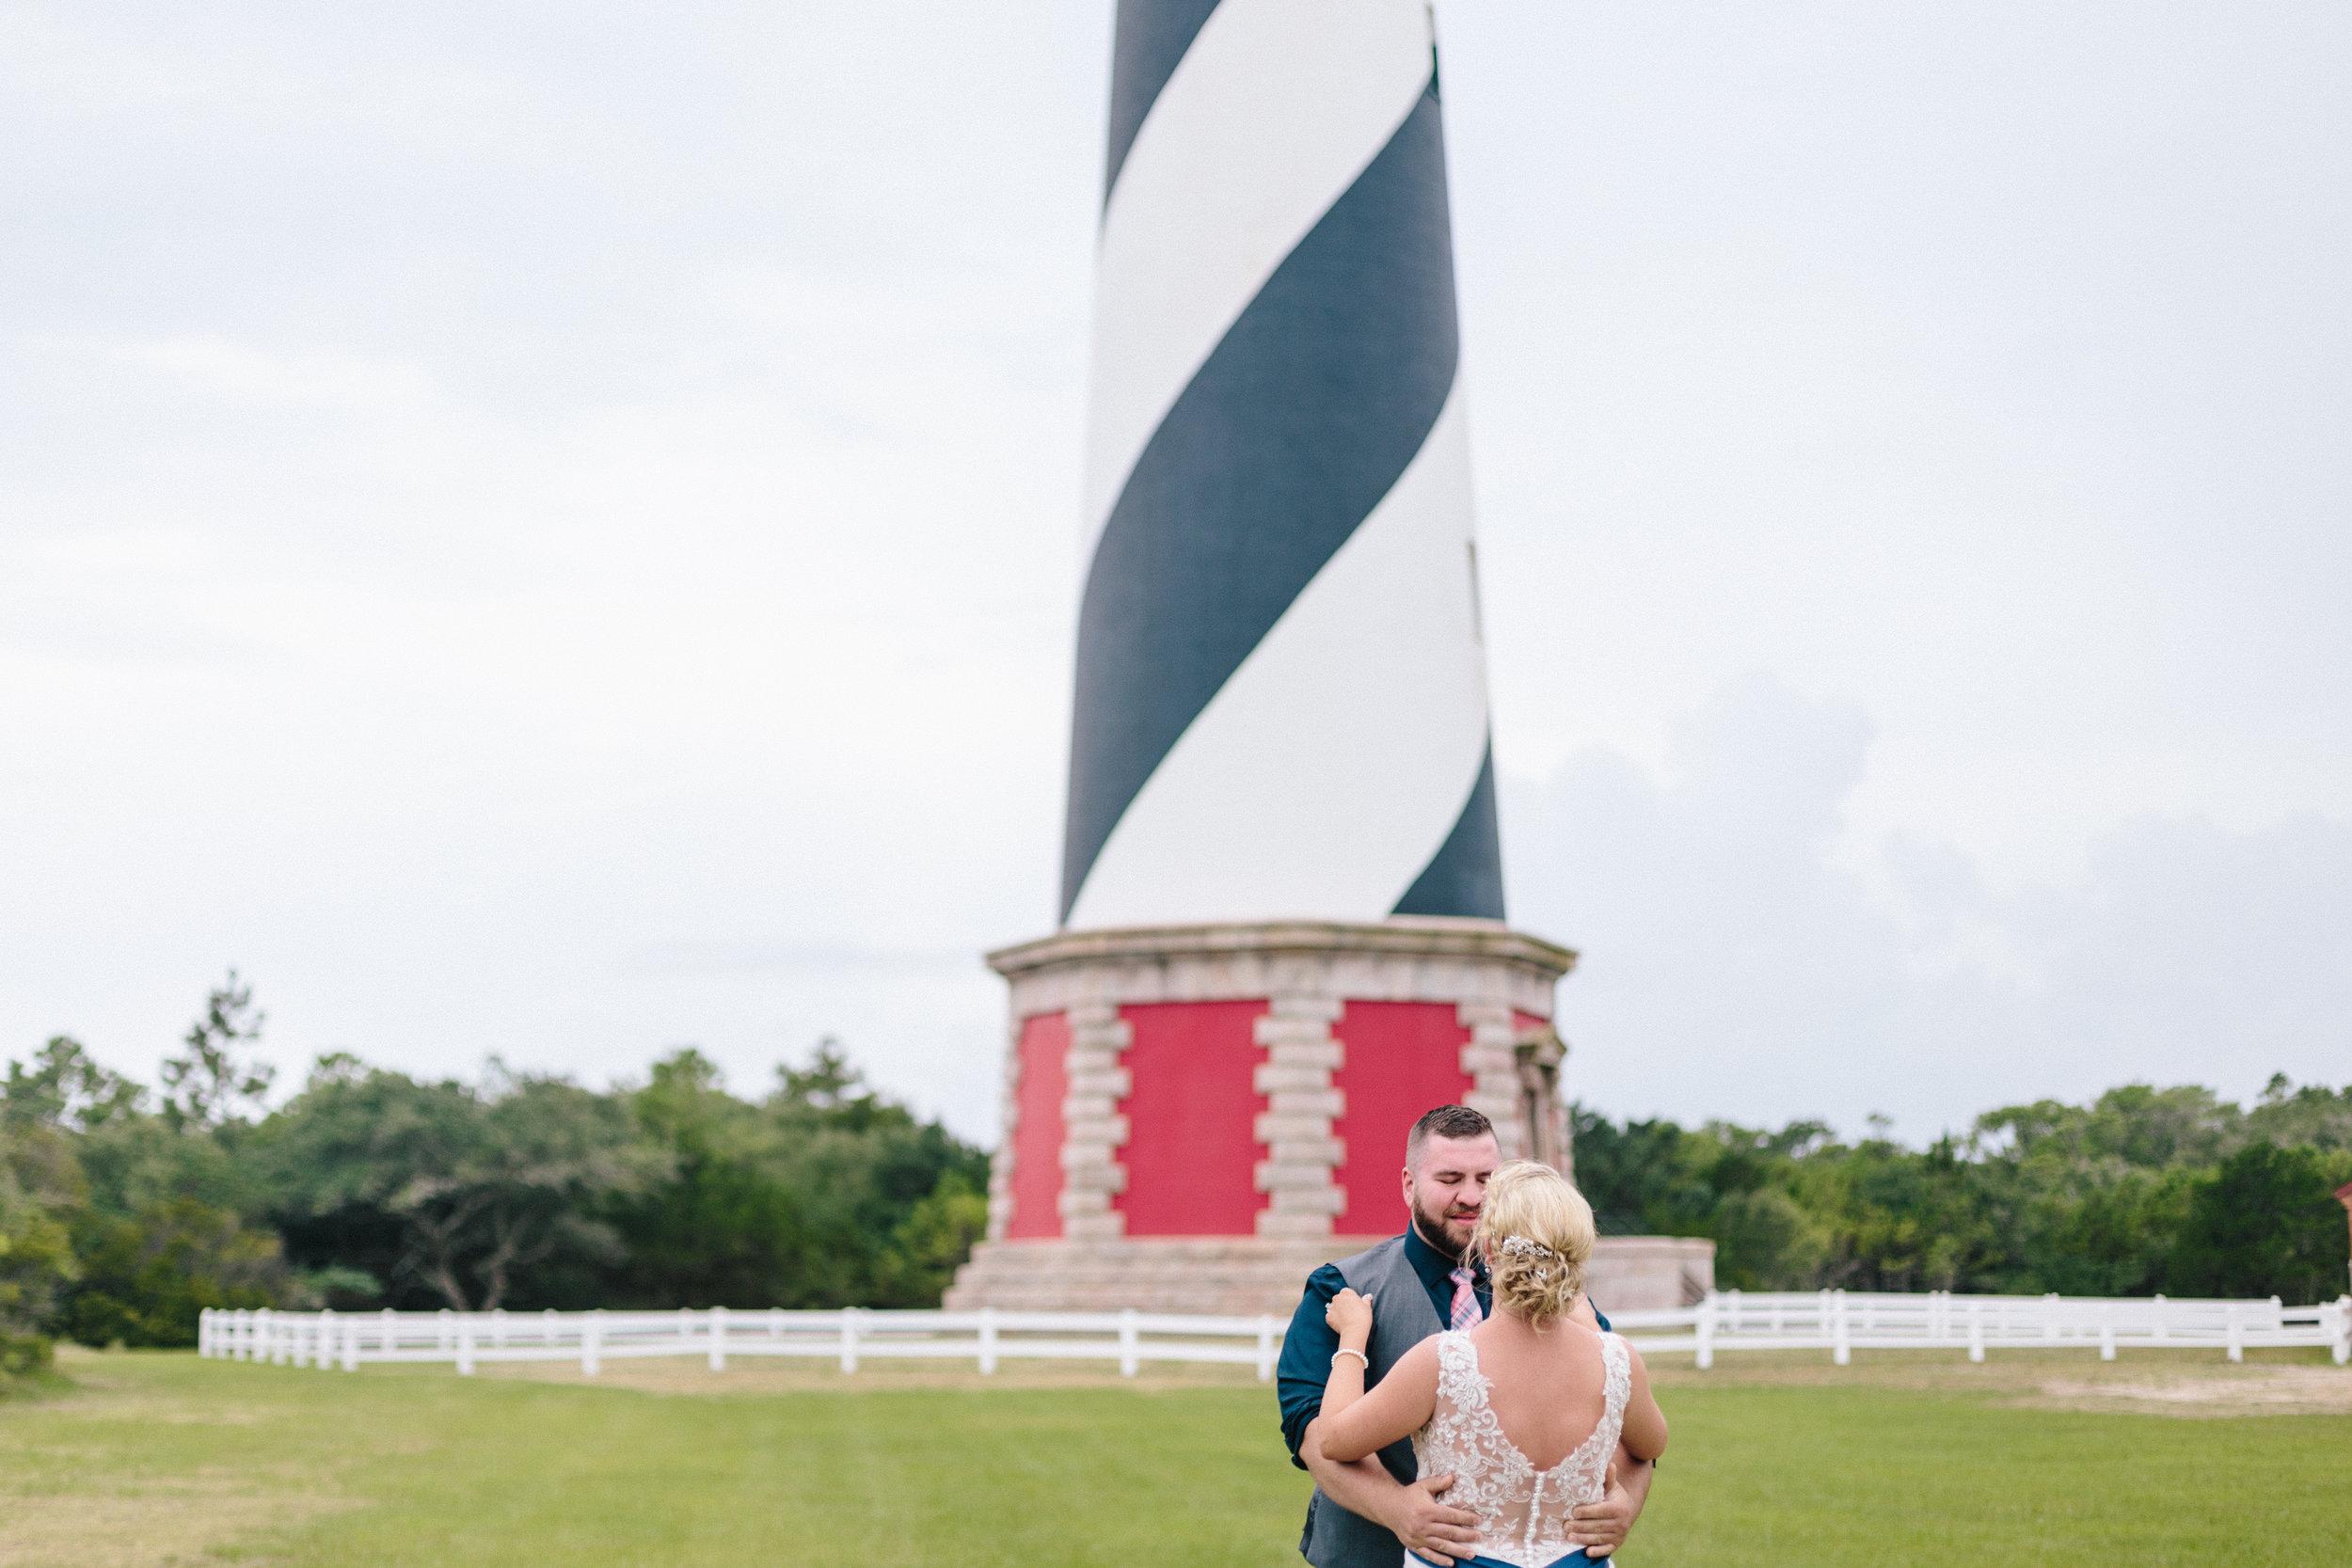 alyssa barletter photography buxton north carolina outer banks obx cape hatteras elopement intmate beach wedding-19.jpg